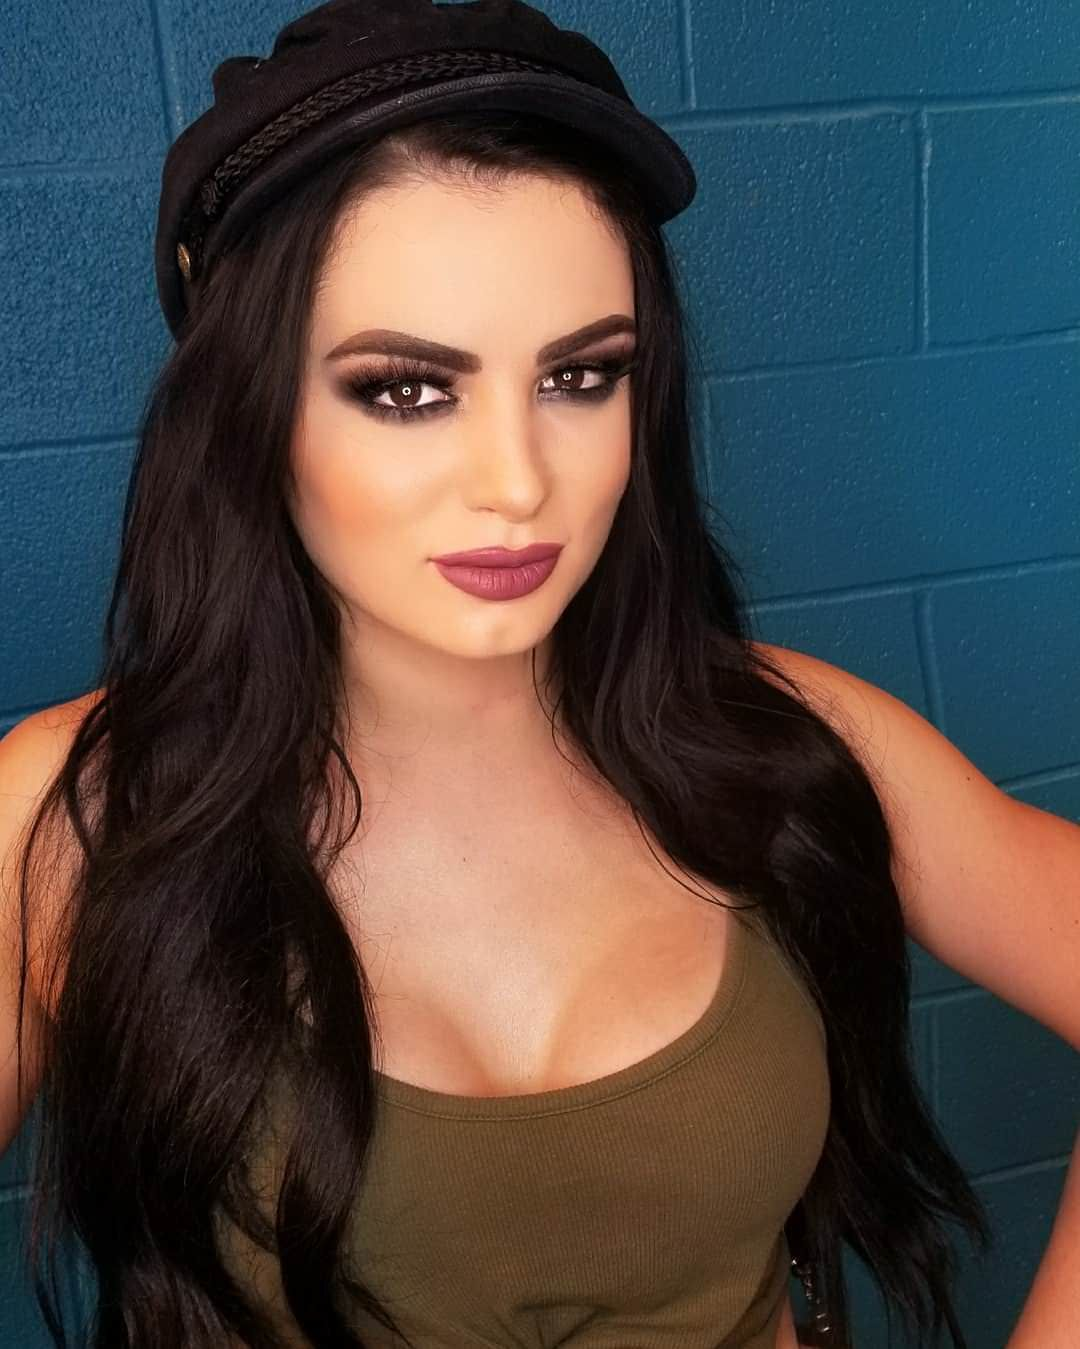 ICloud Saraya-Jade Rodriguez nudes (81 photos), Sexy, Leaked, Twitter, in bikini 2017